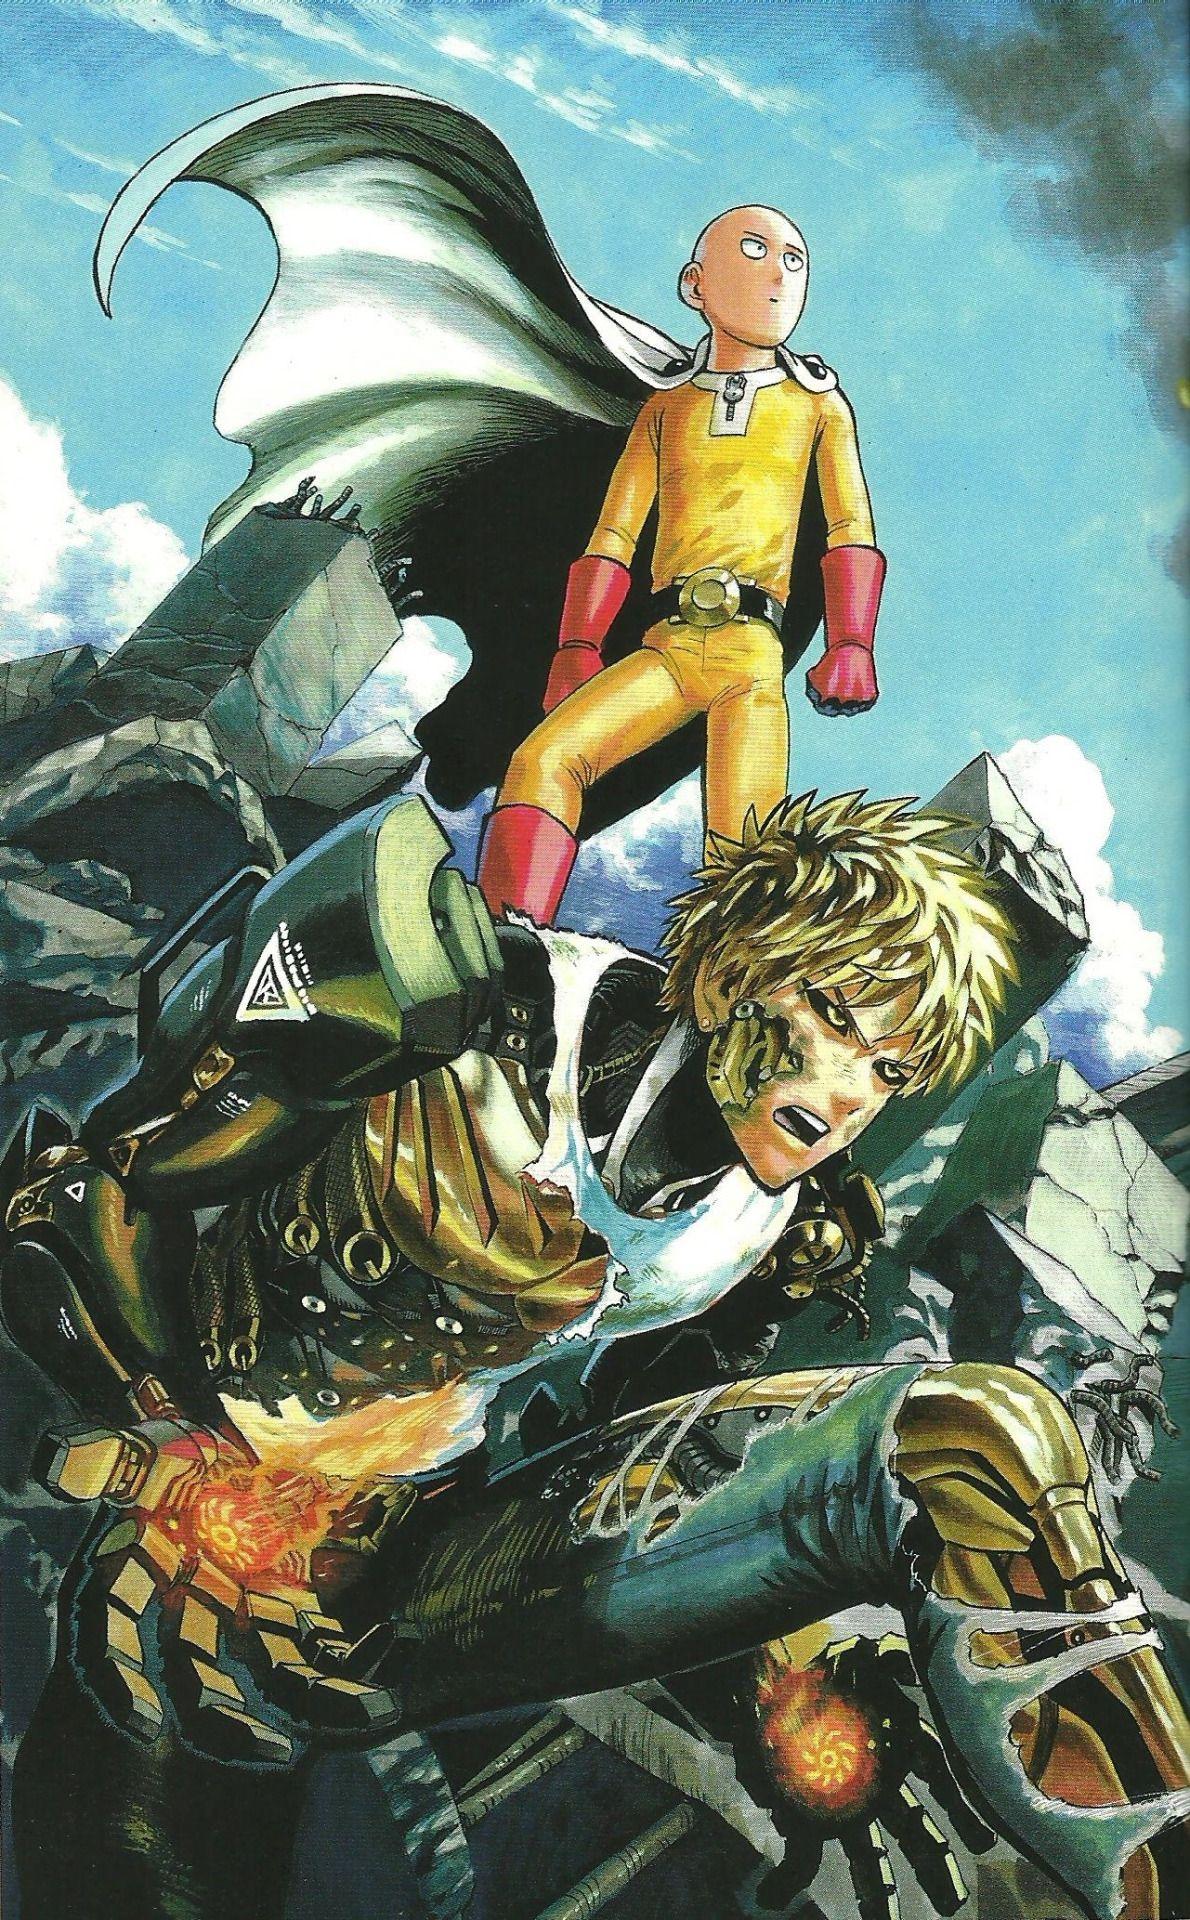 One Punch Man One Punch Man Anime One Punch Man Saitama One Punch Man